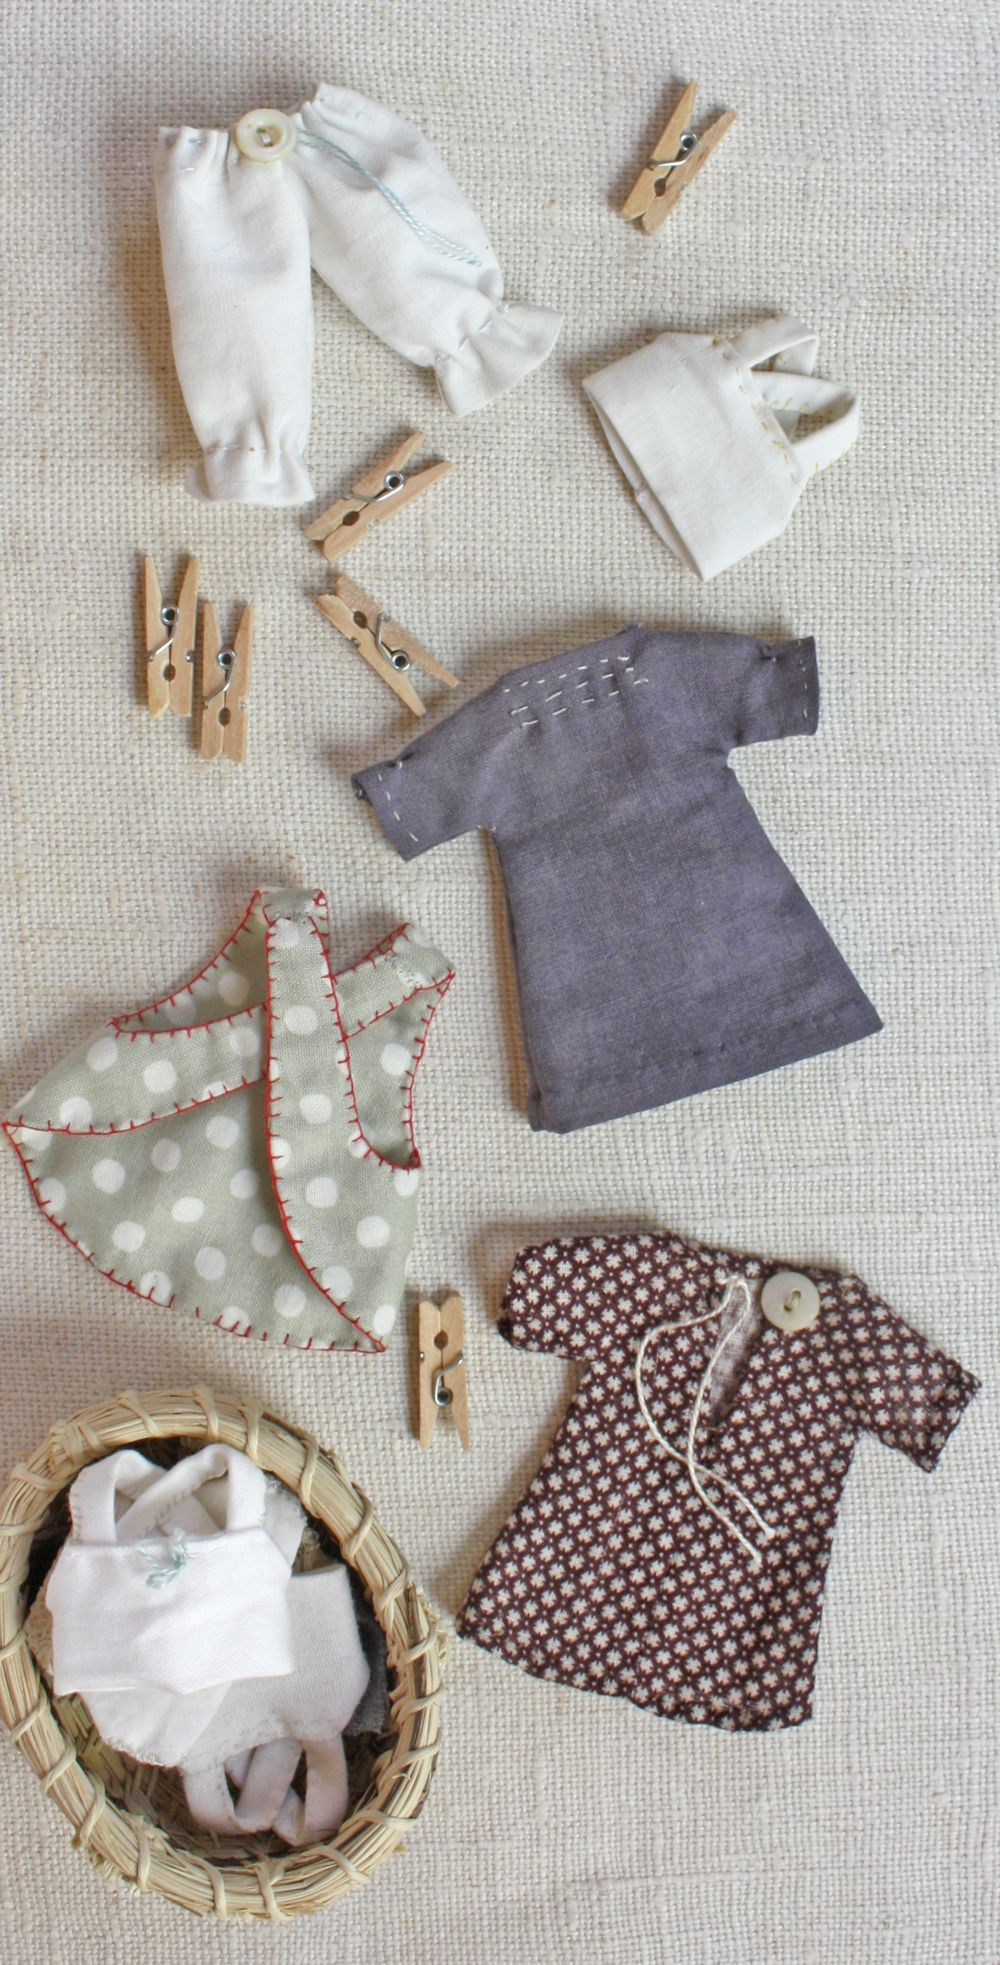 cf76b2b6aaf5 tiny rag doll sewing pattern Handmade Rag Dolls